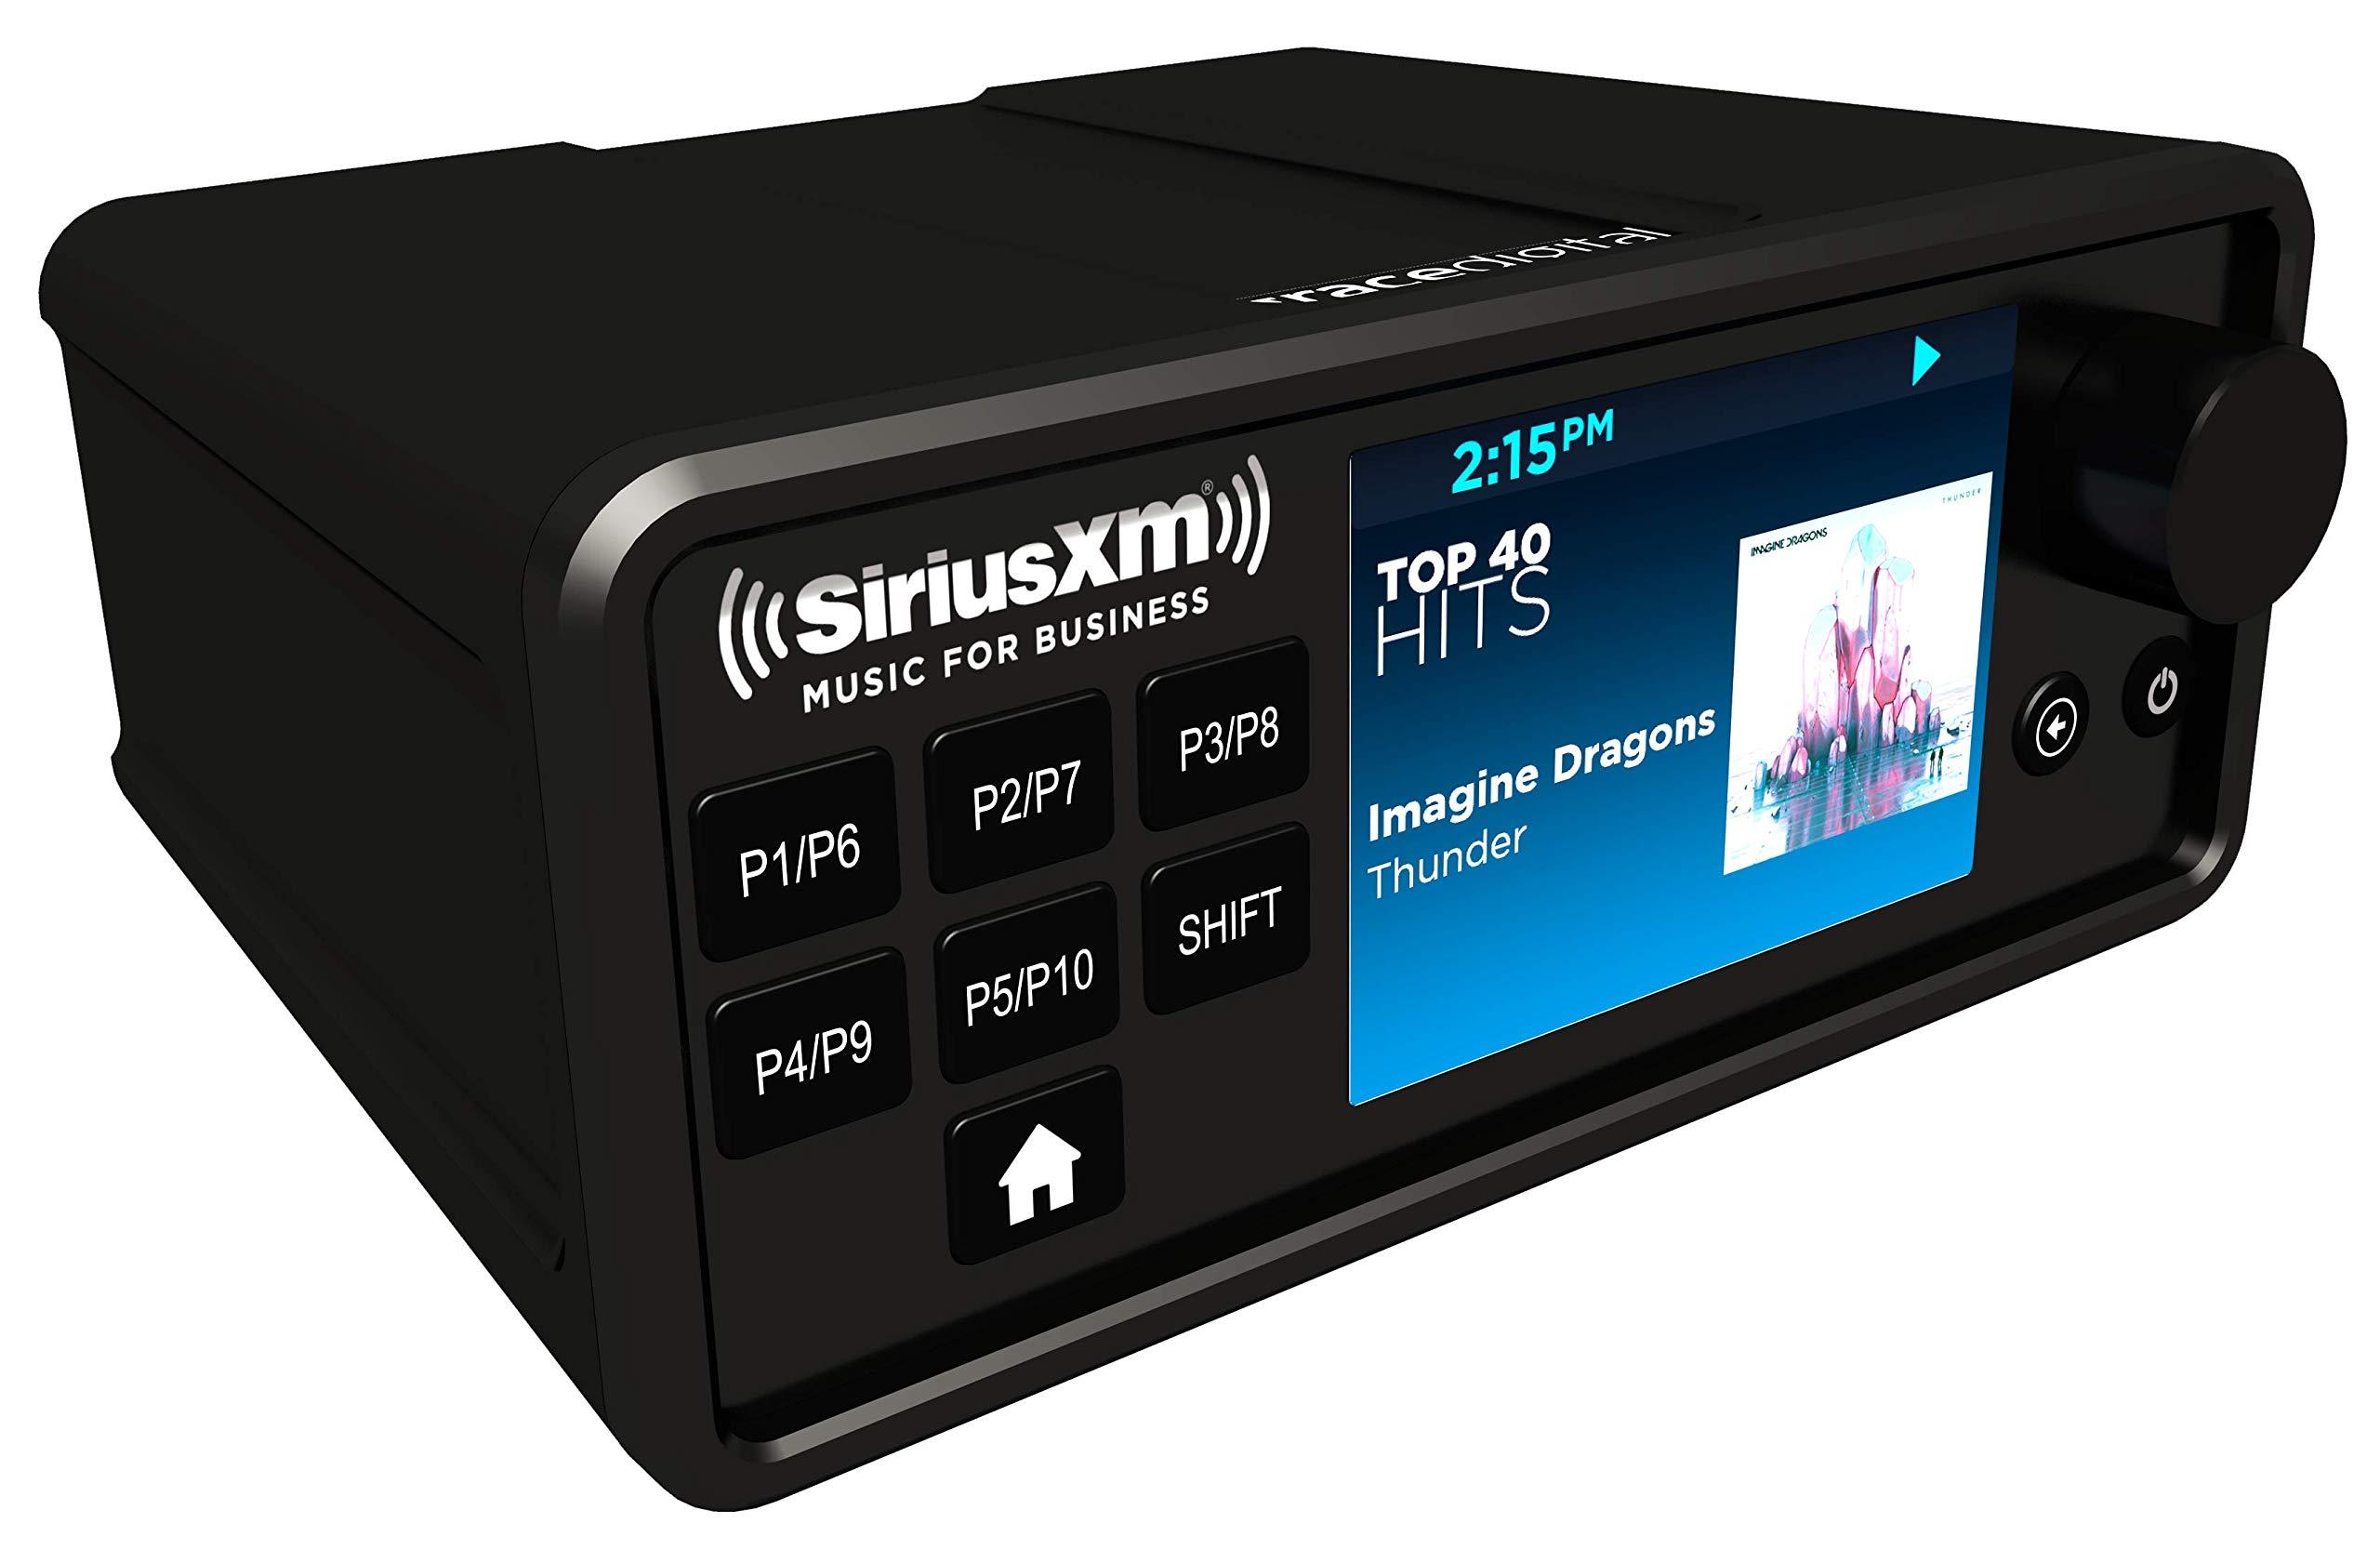 SiriusXM GDI-SXBR2 Music for Business Internet Radio by SiriusXM